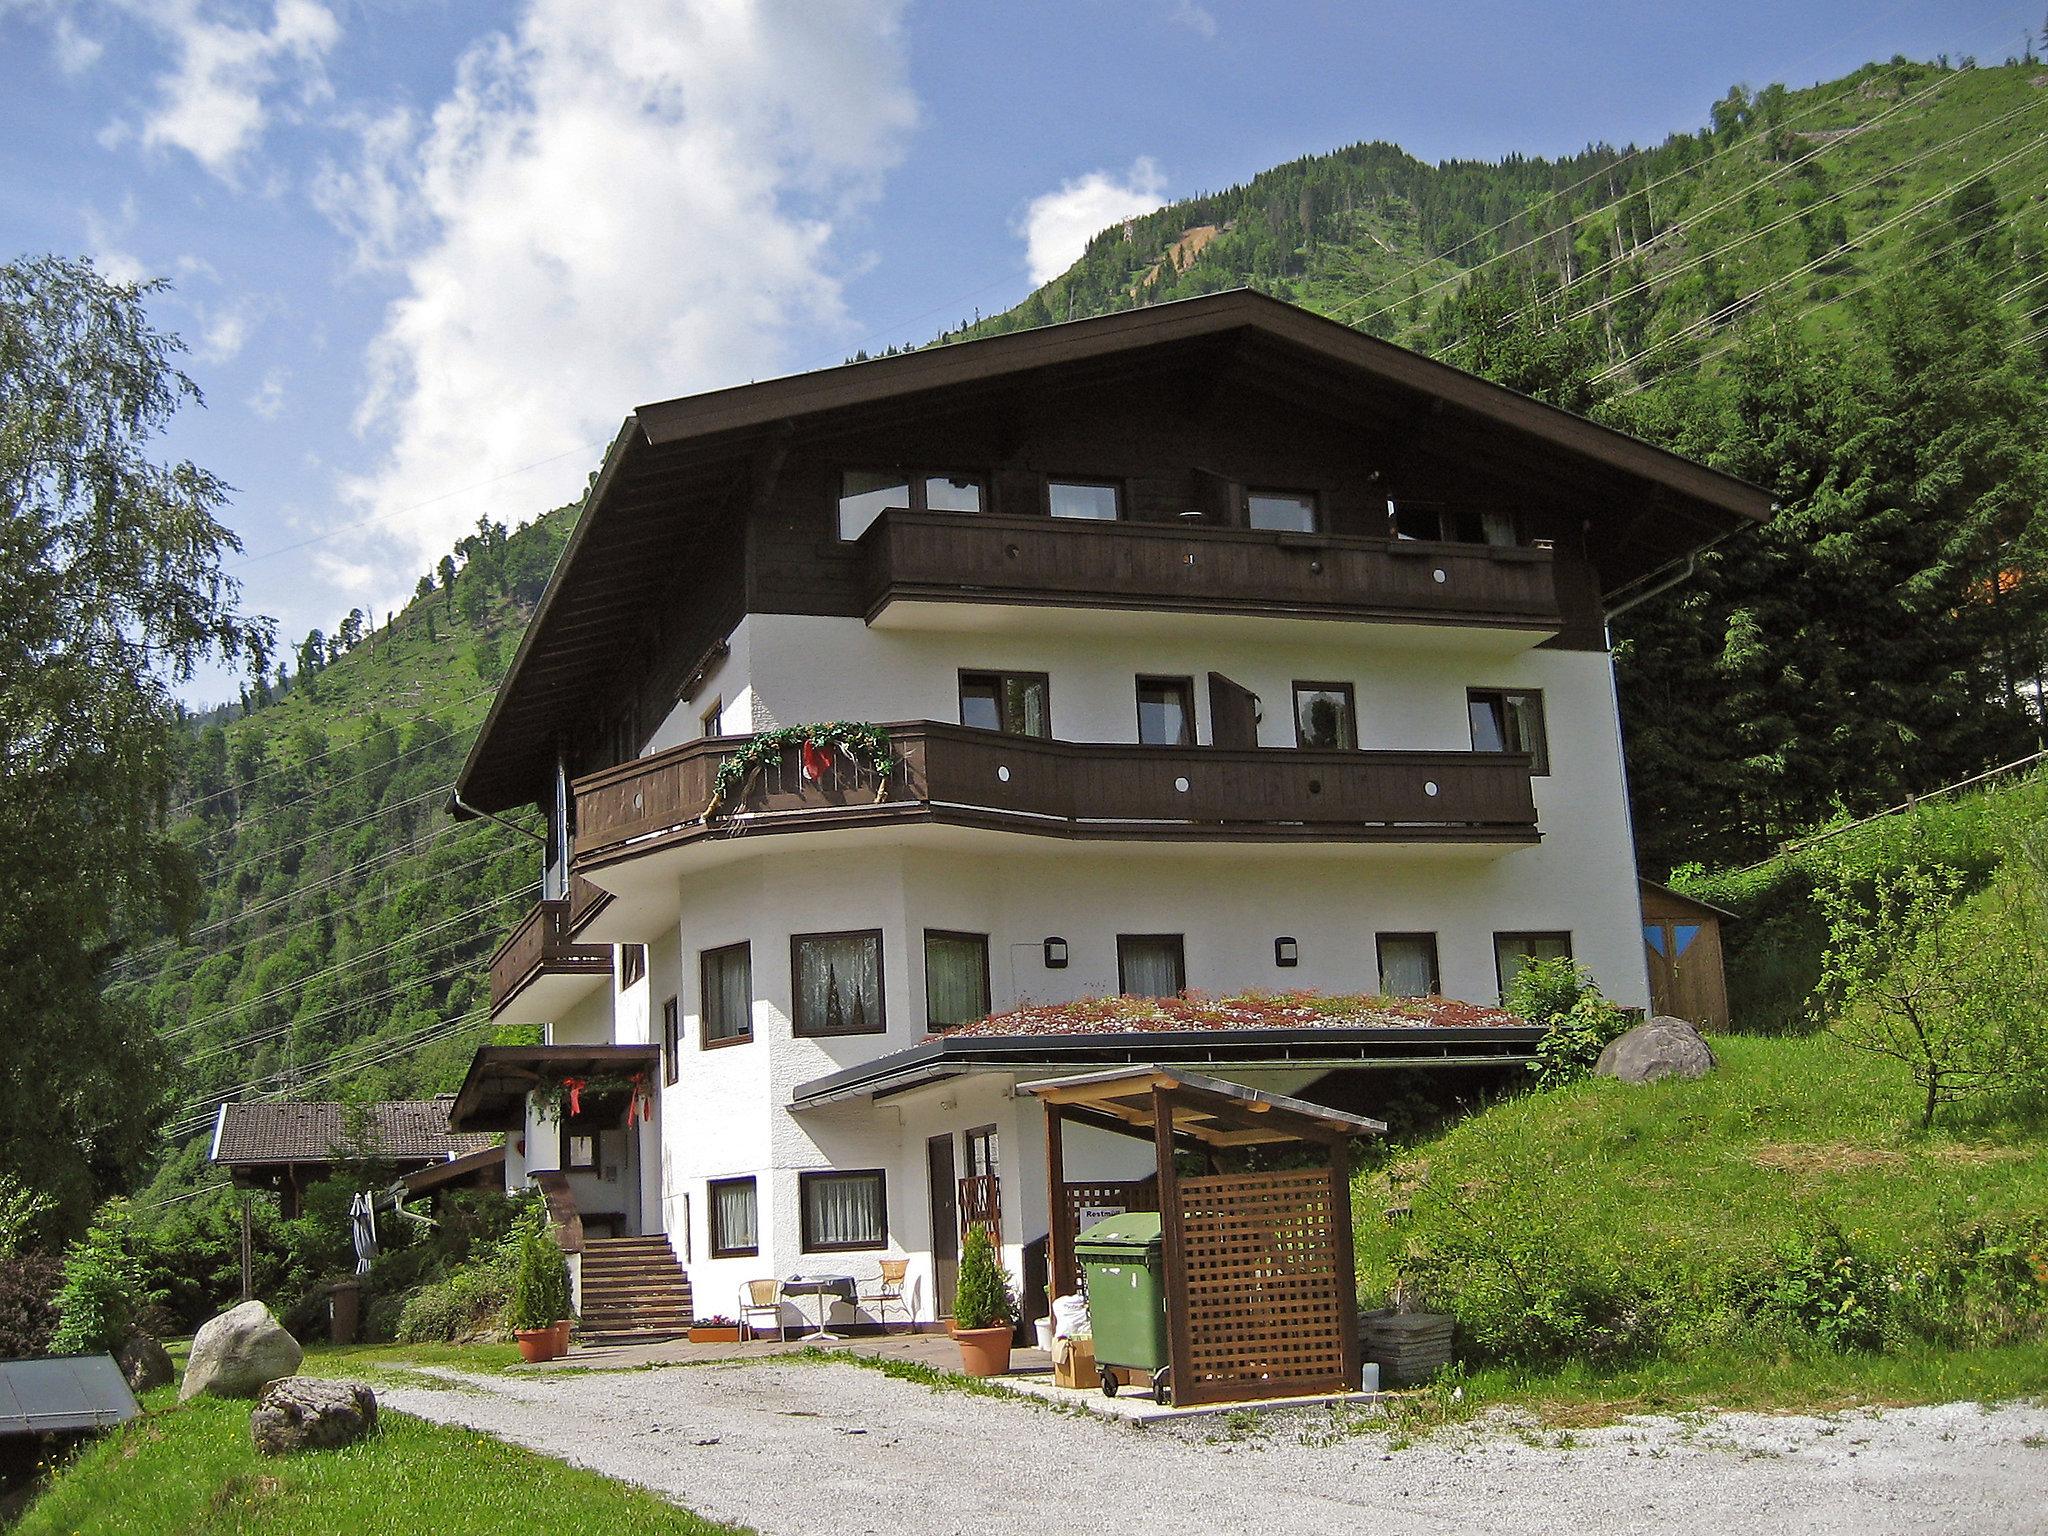 Apartment haus ental kaprun for Apartment haus